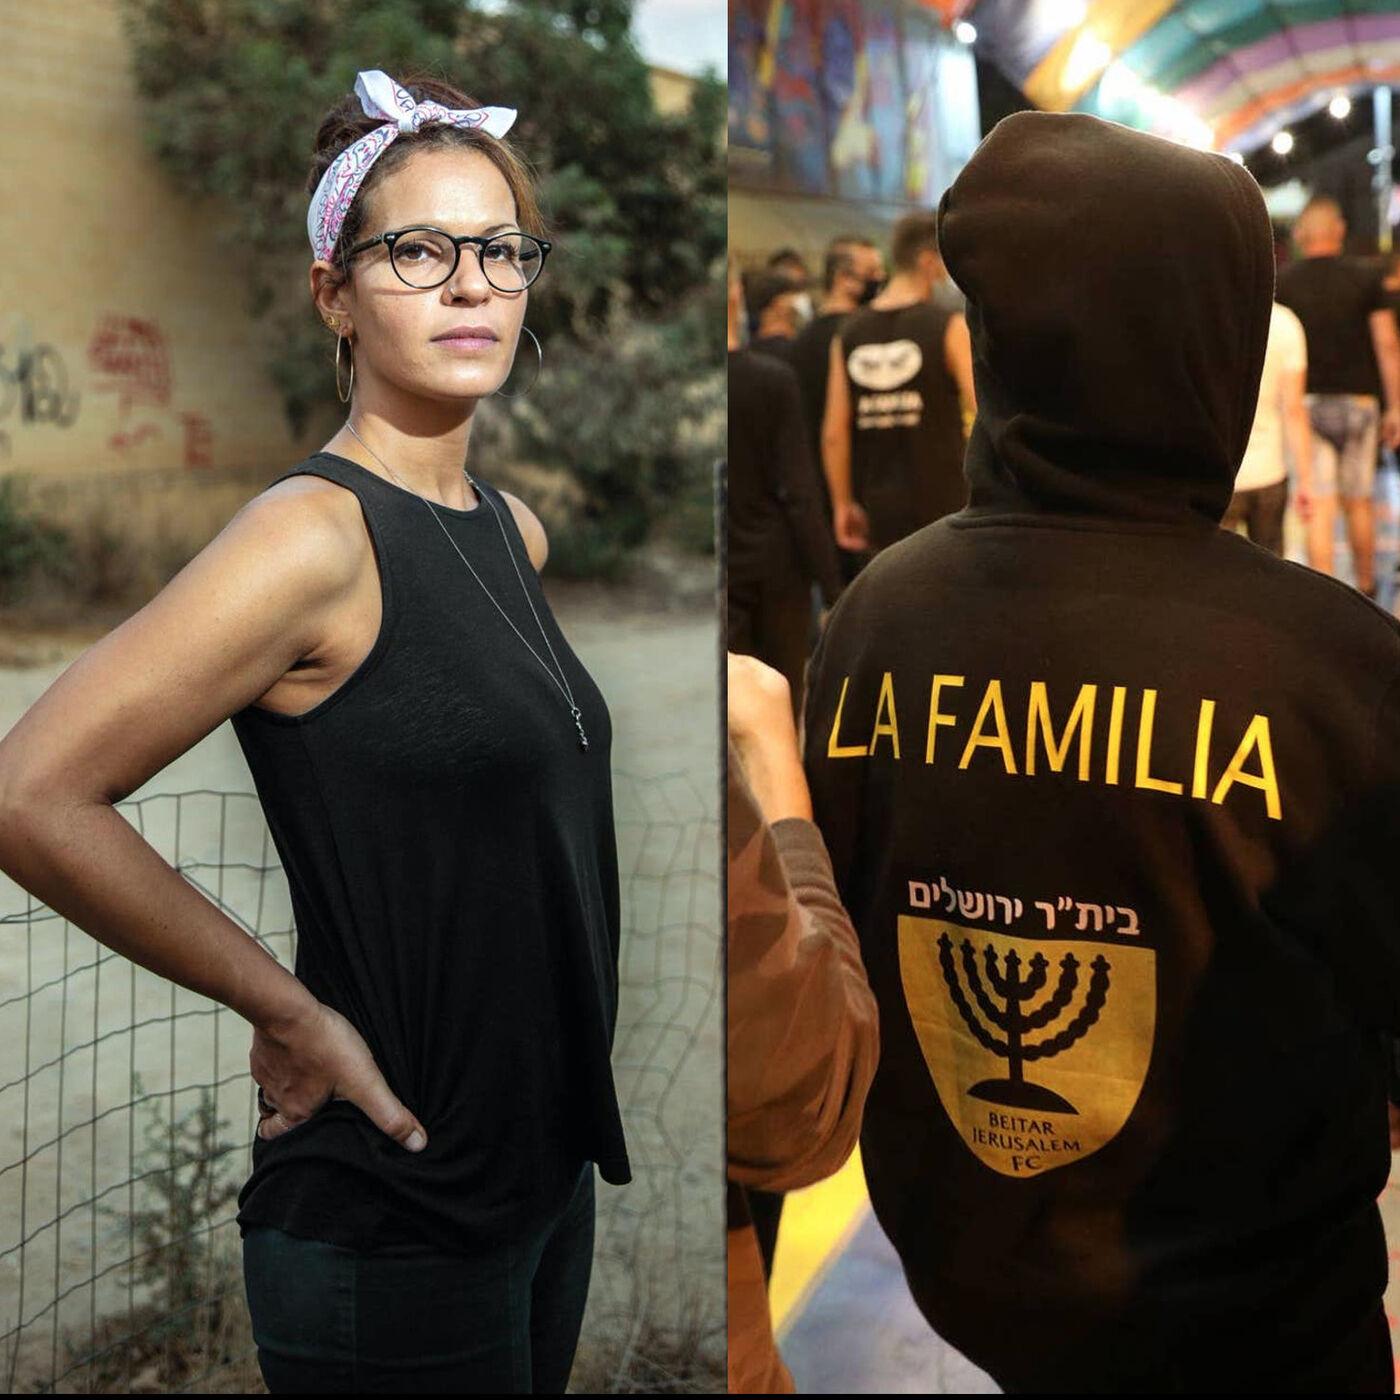 21. Sophia Solomon on Beitar Jerusalem, La Familia, and football and far right in Israel